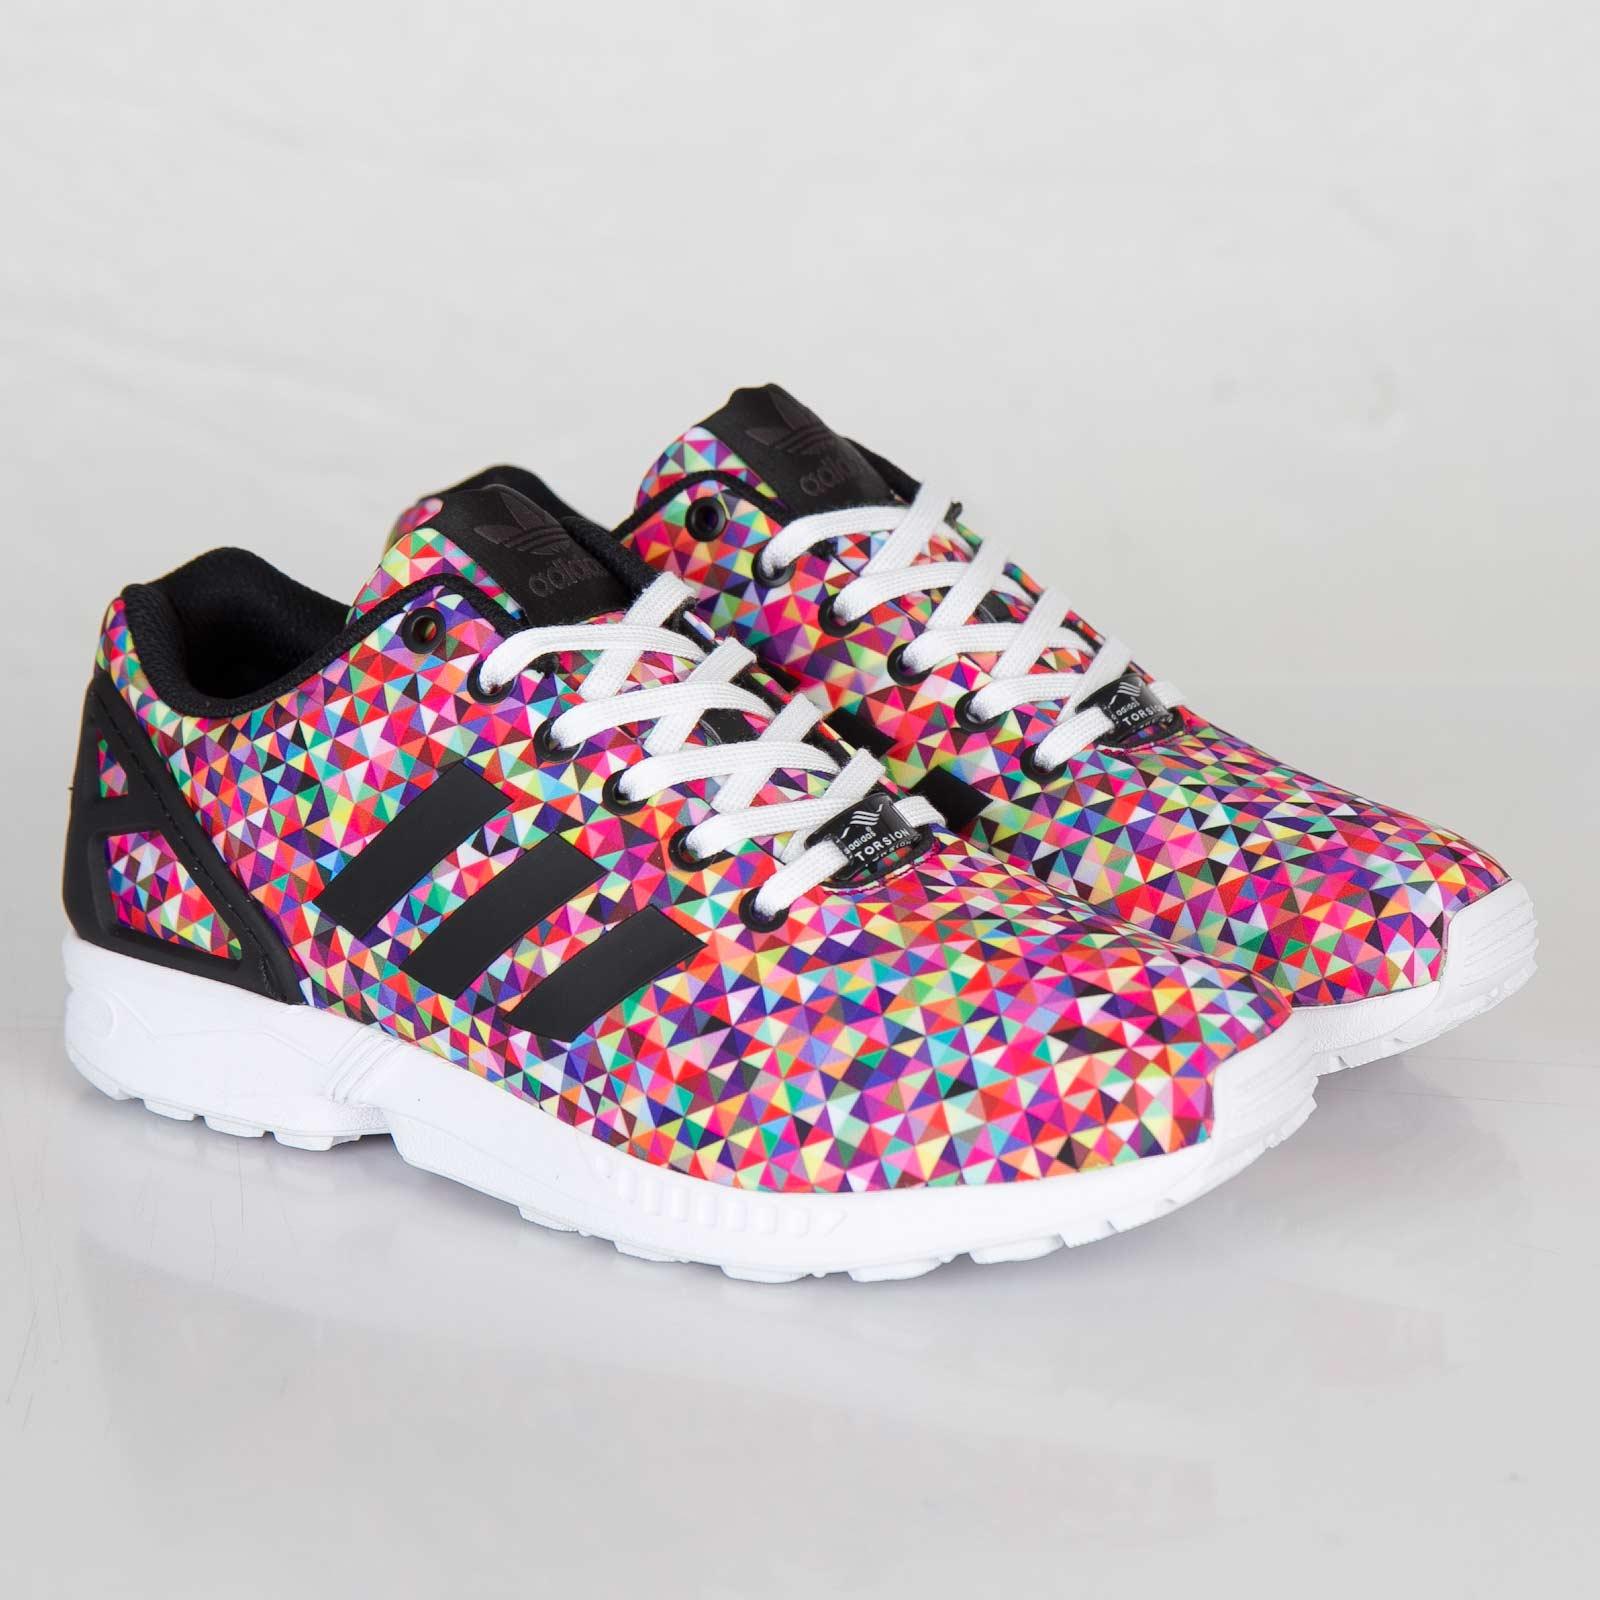 adidas ZX Flux - M19845 - Sneakersnstuff | sneakers ...